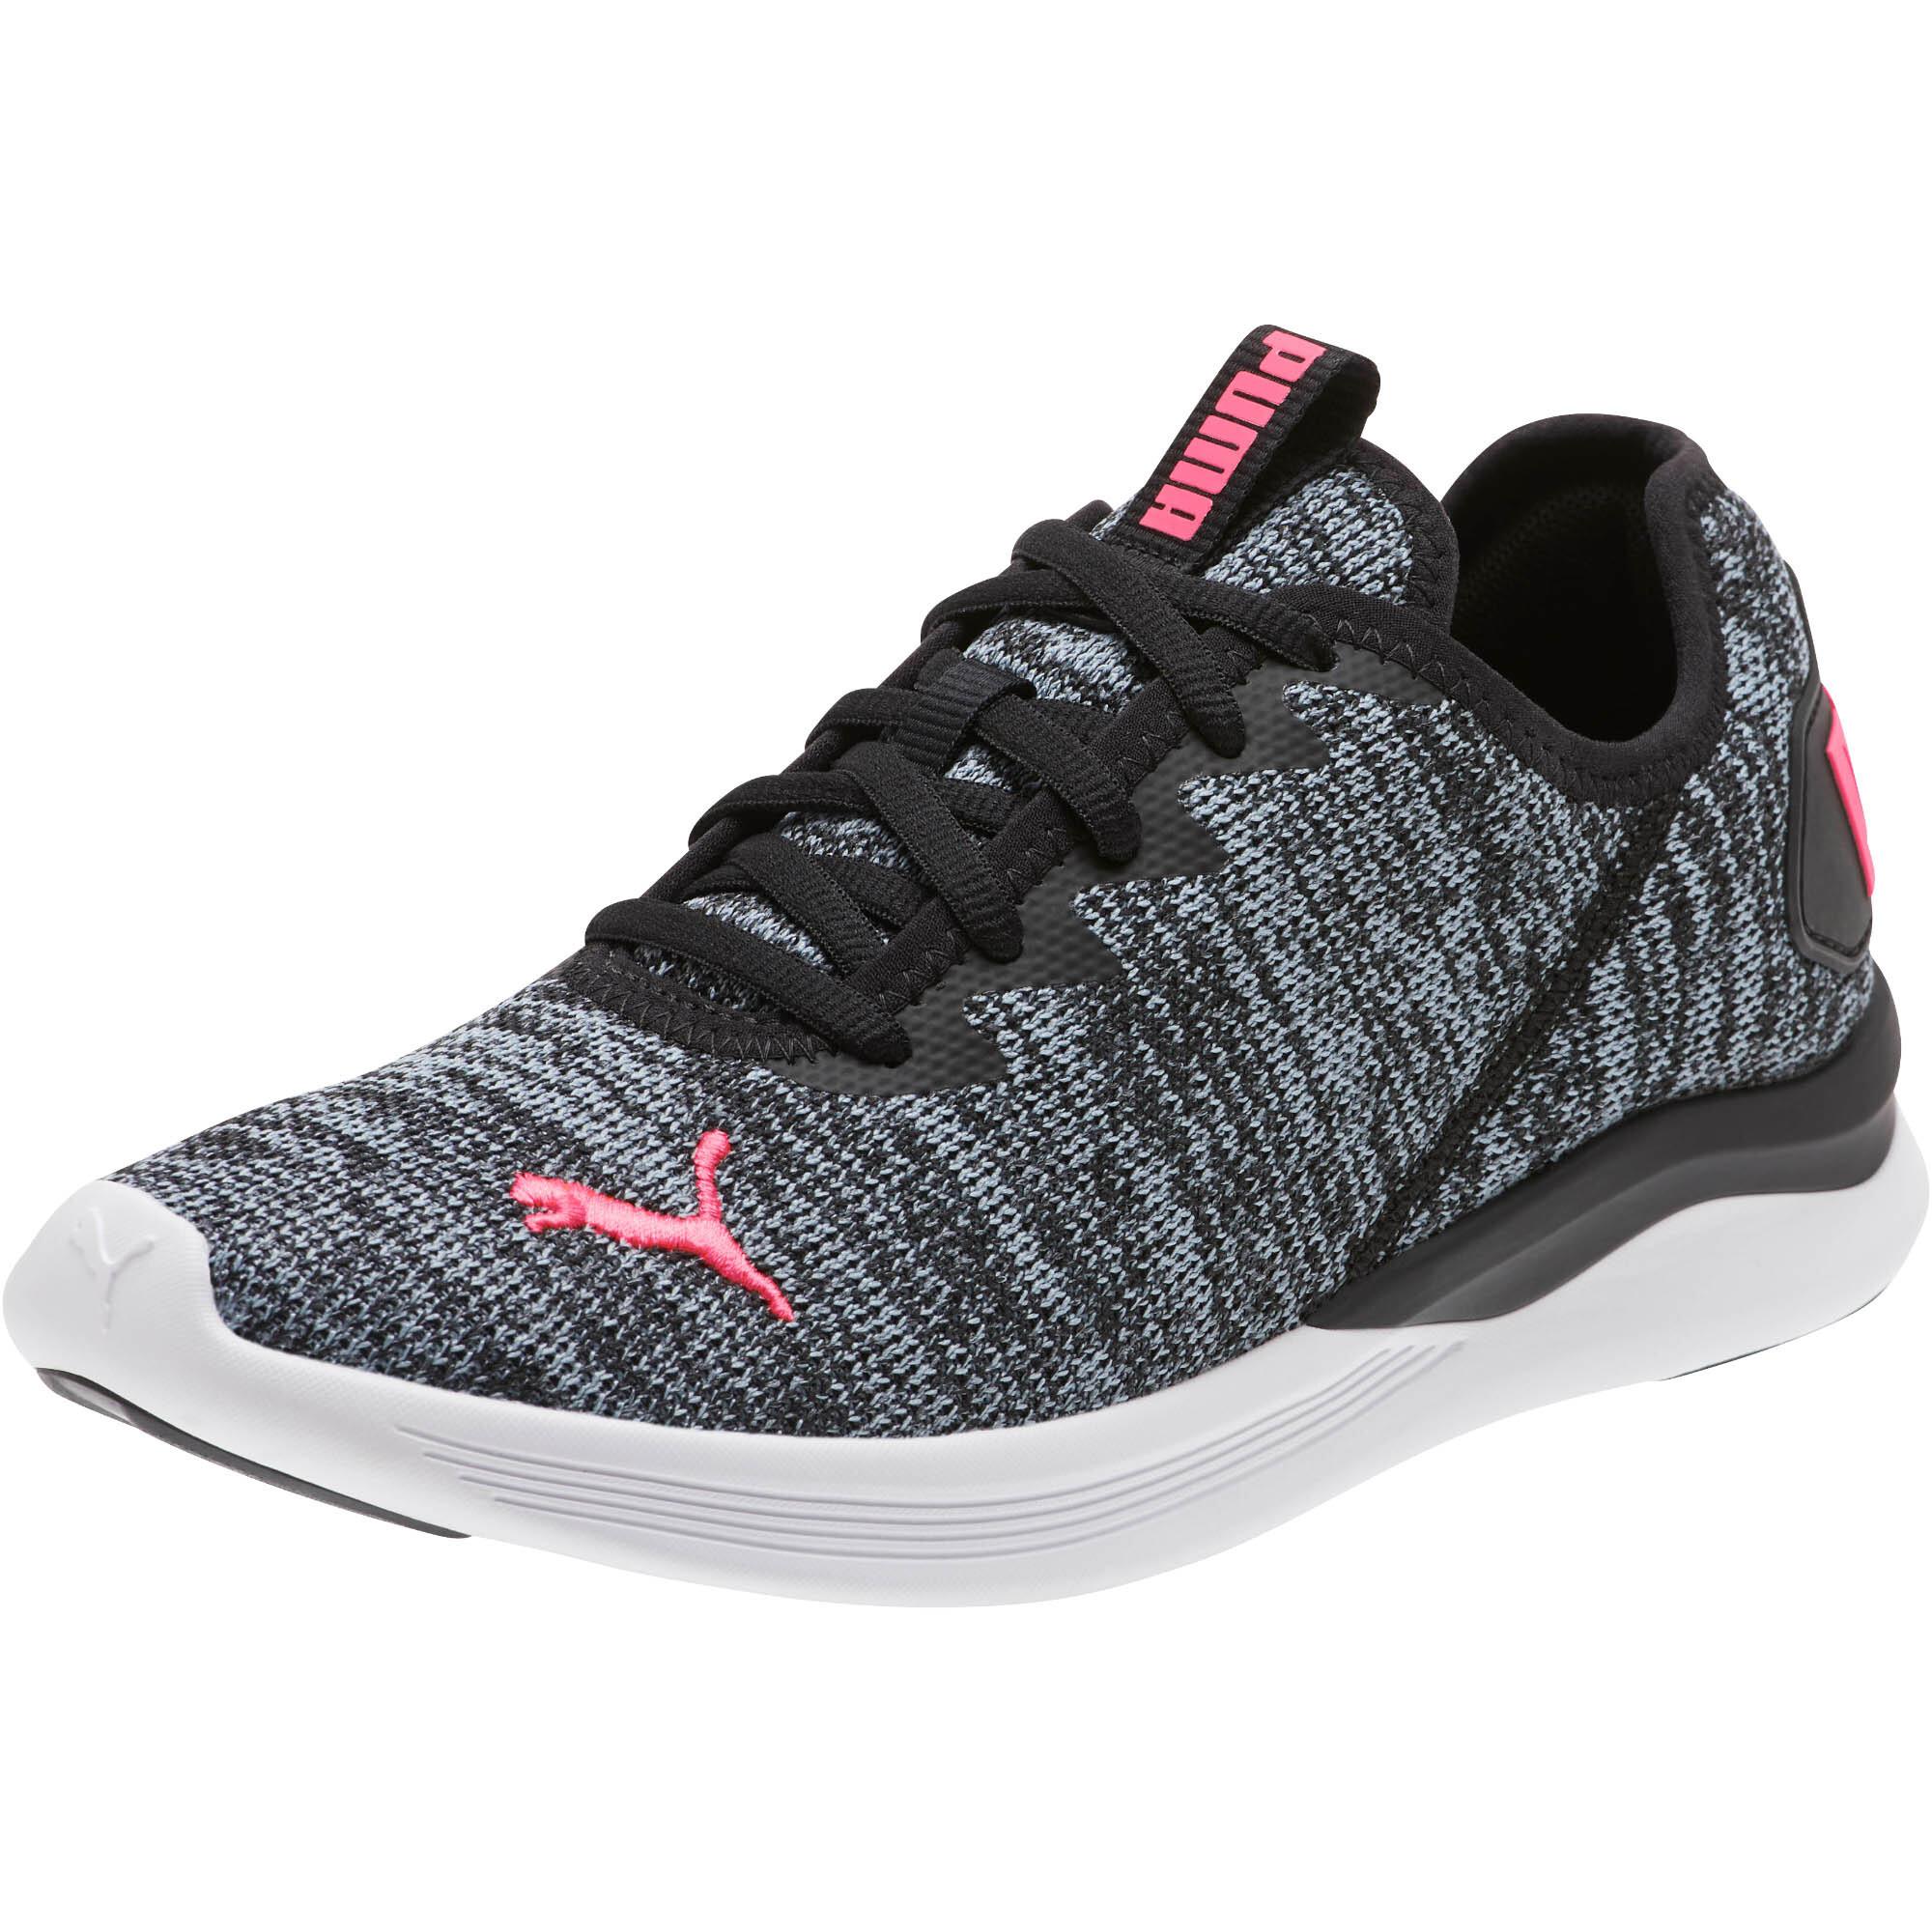 PUMA-Ballast-Women-039-s-Running-Shoes-Women-Shoe-Running thumbnail 9